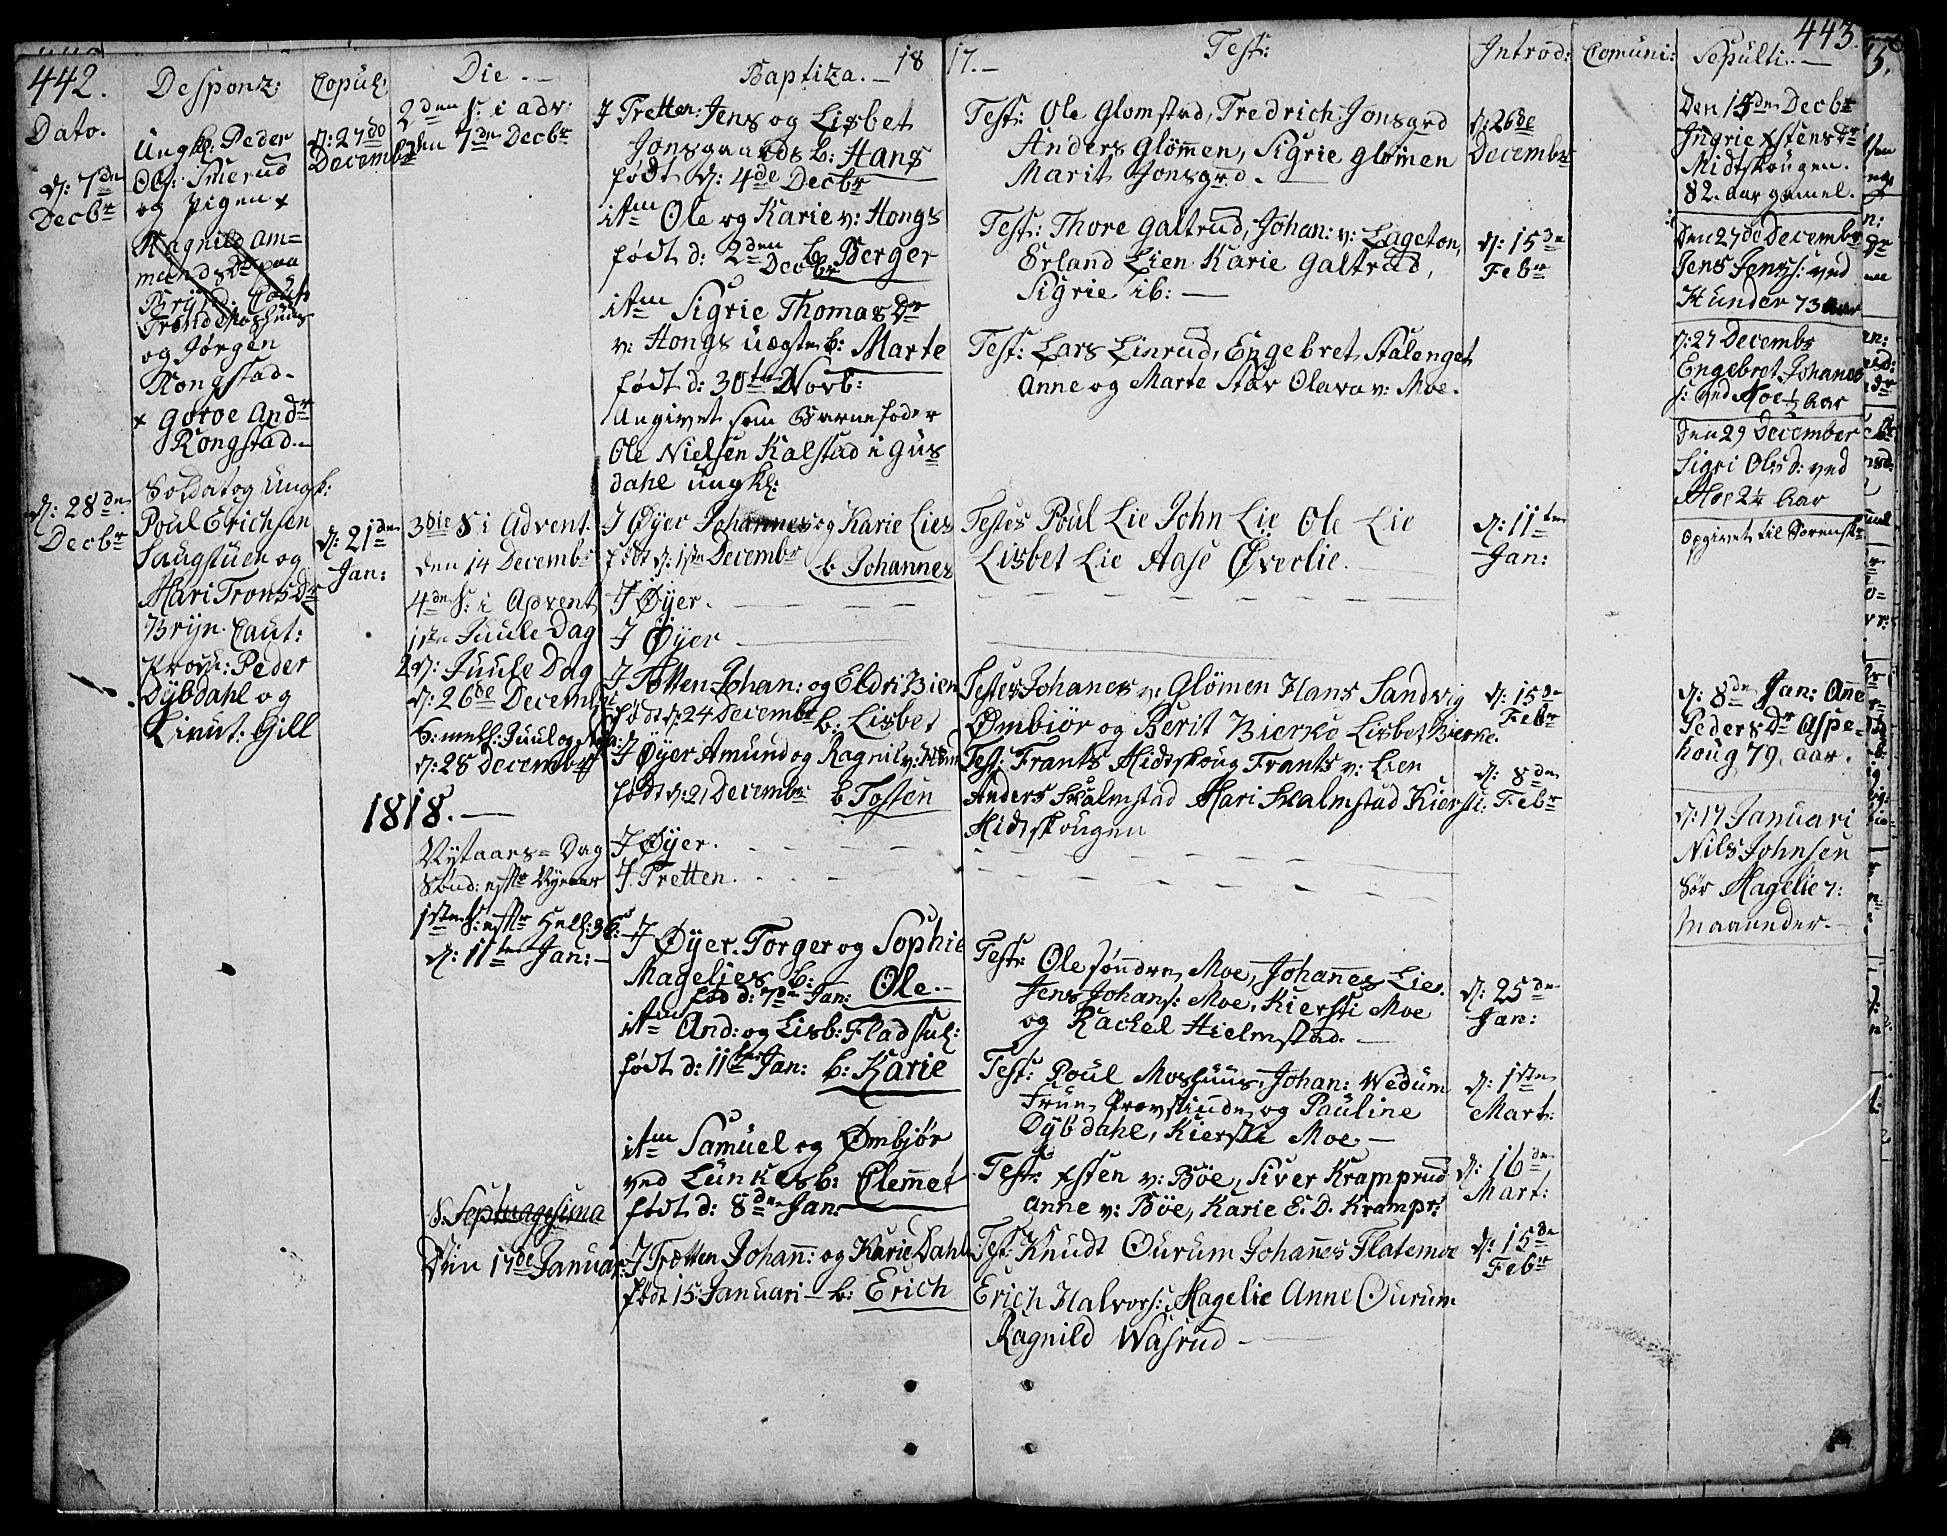 SAH, Øyer prestekontor, Ministerialbok nr. 3, 1784-1824, s. 442-443